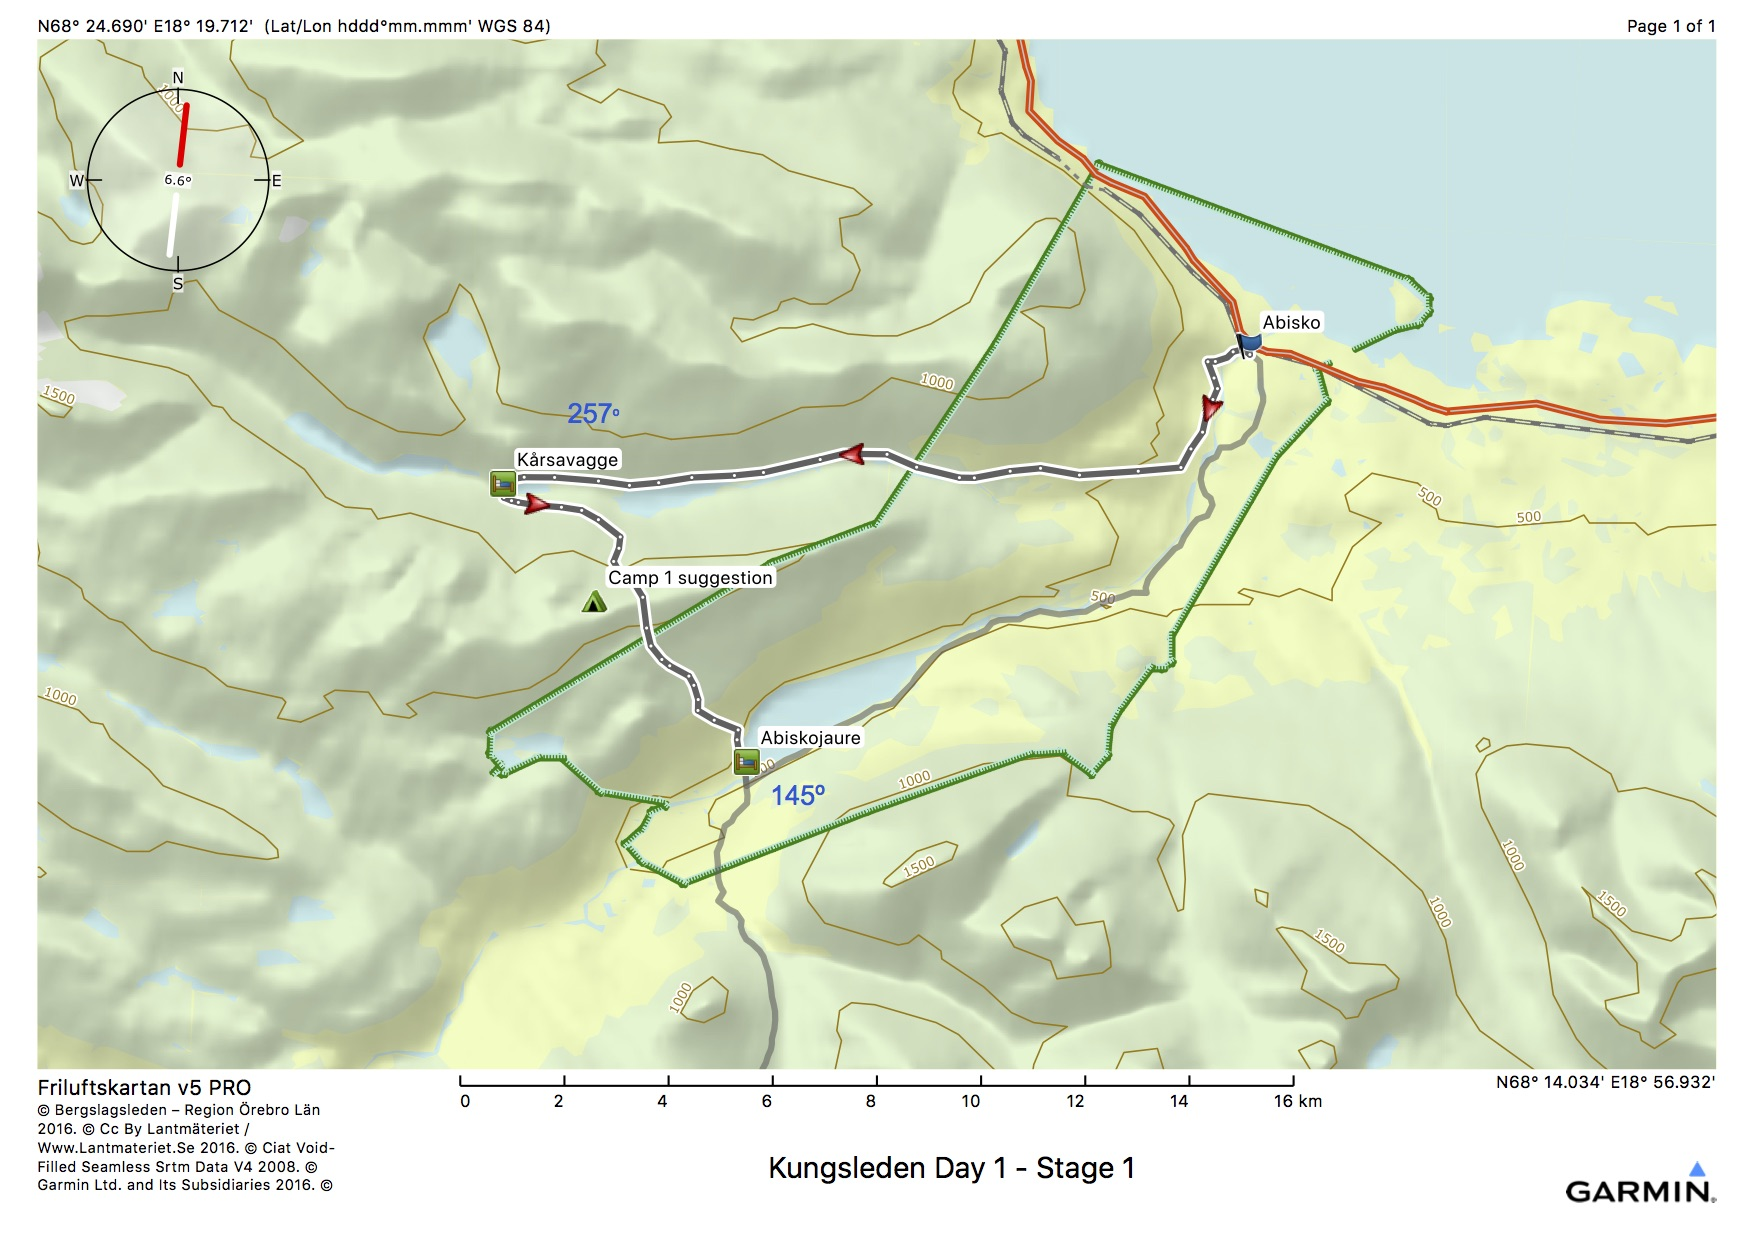 Kungsleden Day 1 - Stage 1